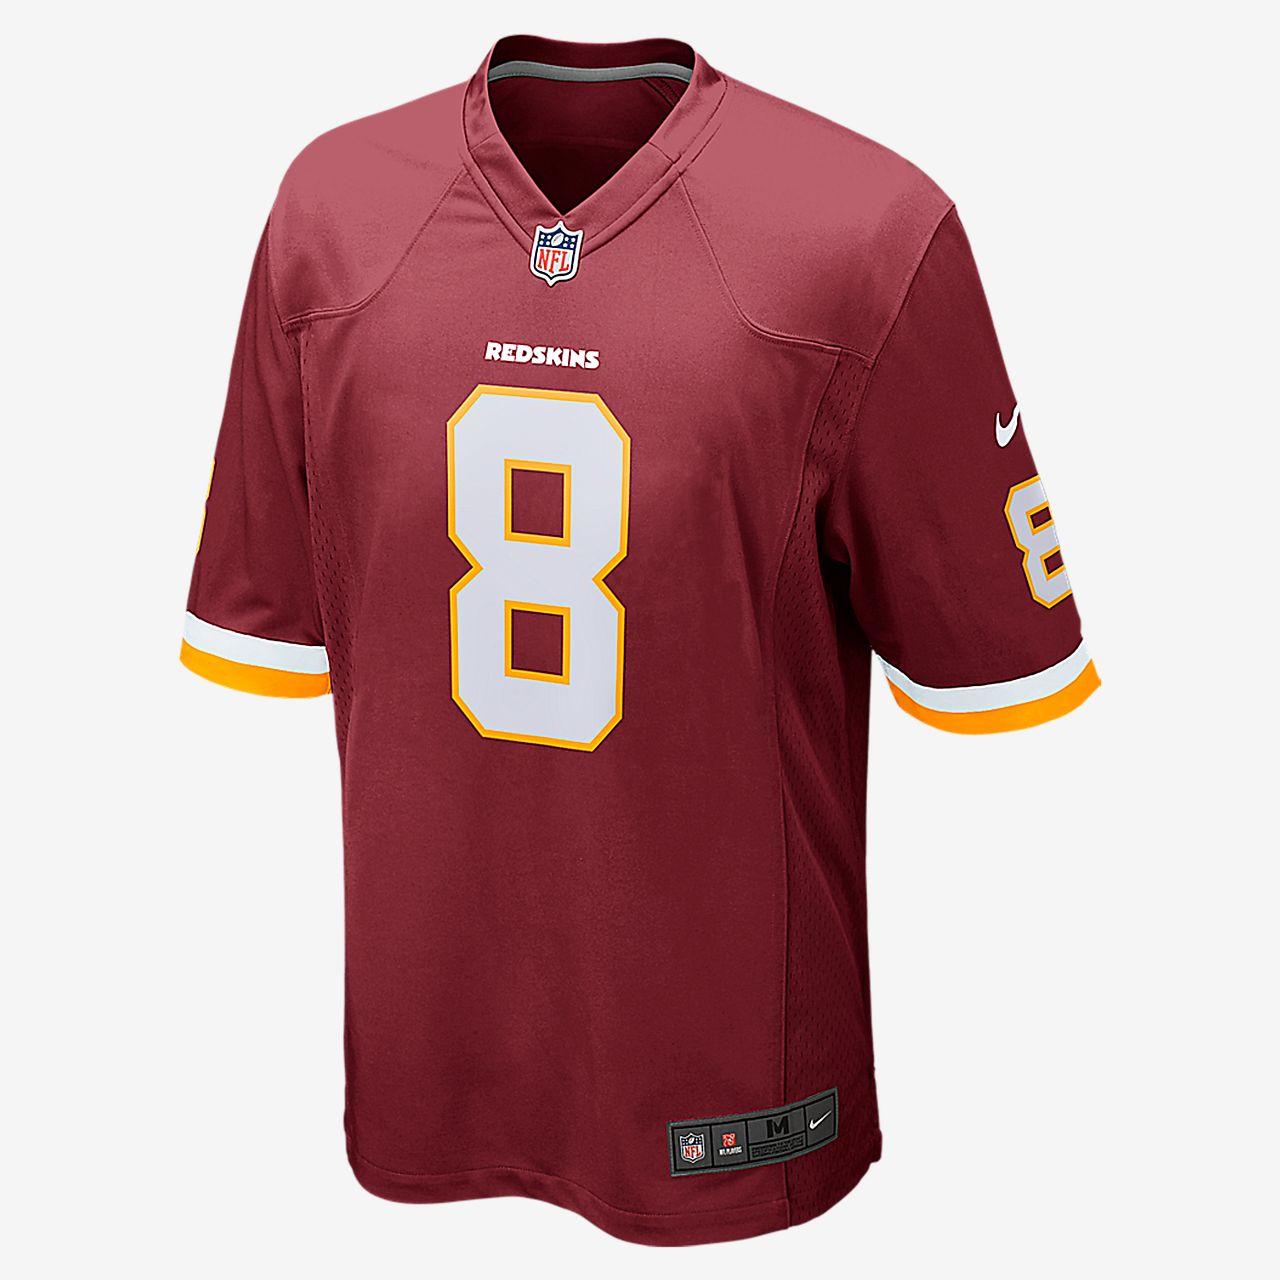 NFL Washington Redskins (Kirk Cousins) Camiseta de fútbol americano de la  1ª equipación - 23413d4e1be